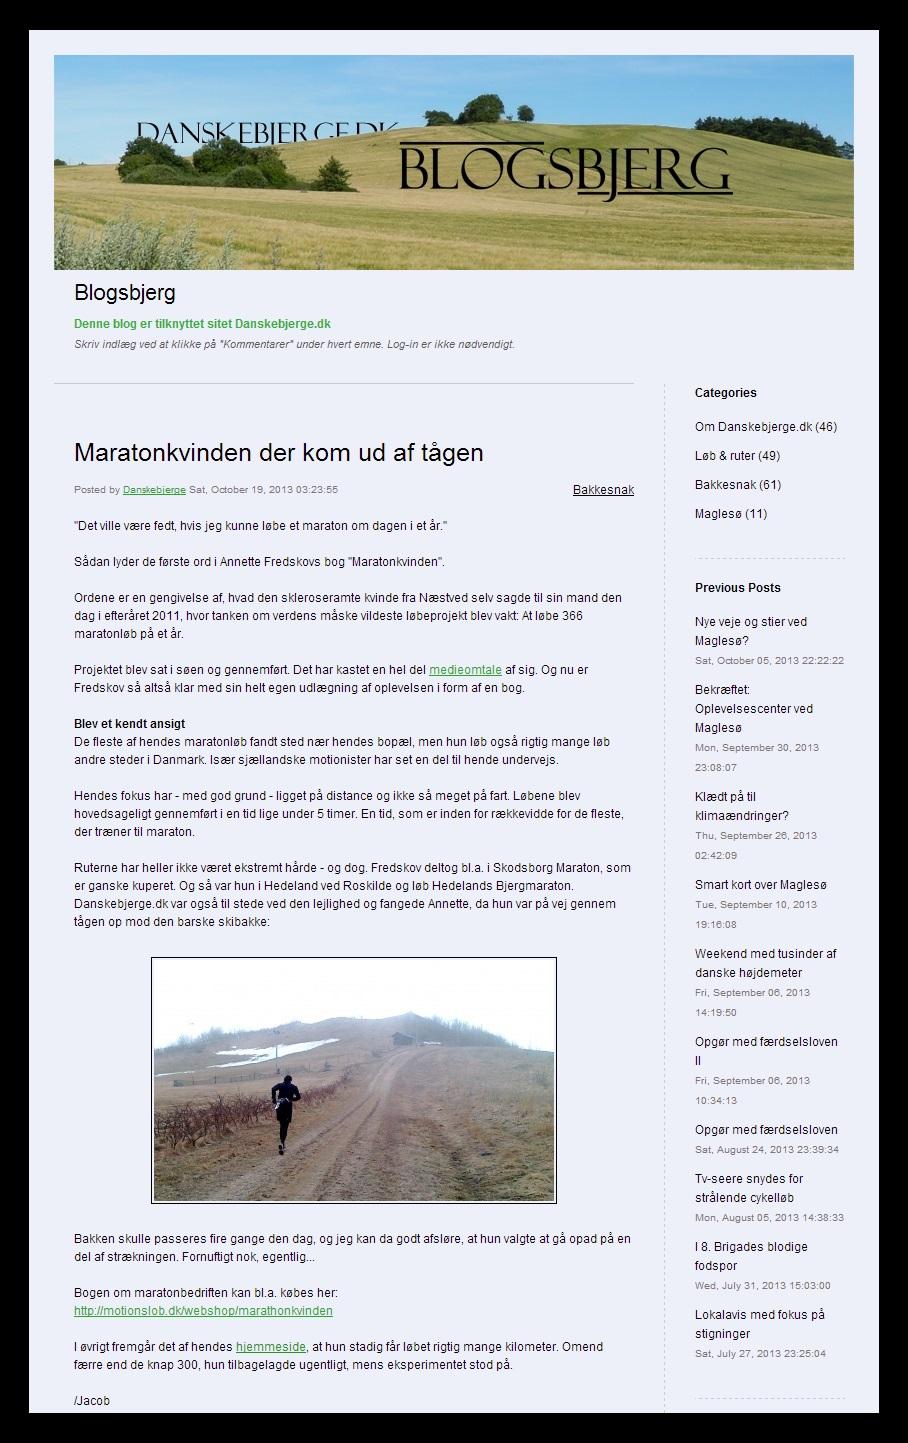 blogsbjerg.danskebjerge.dk 2013.10.19